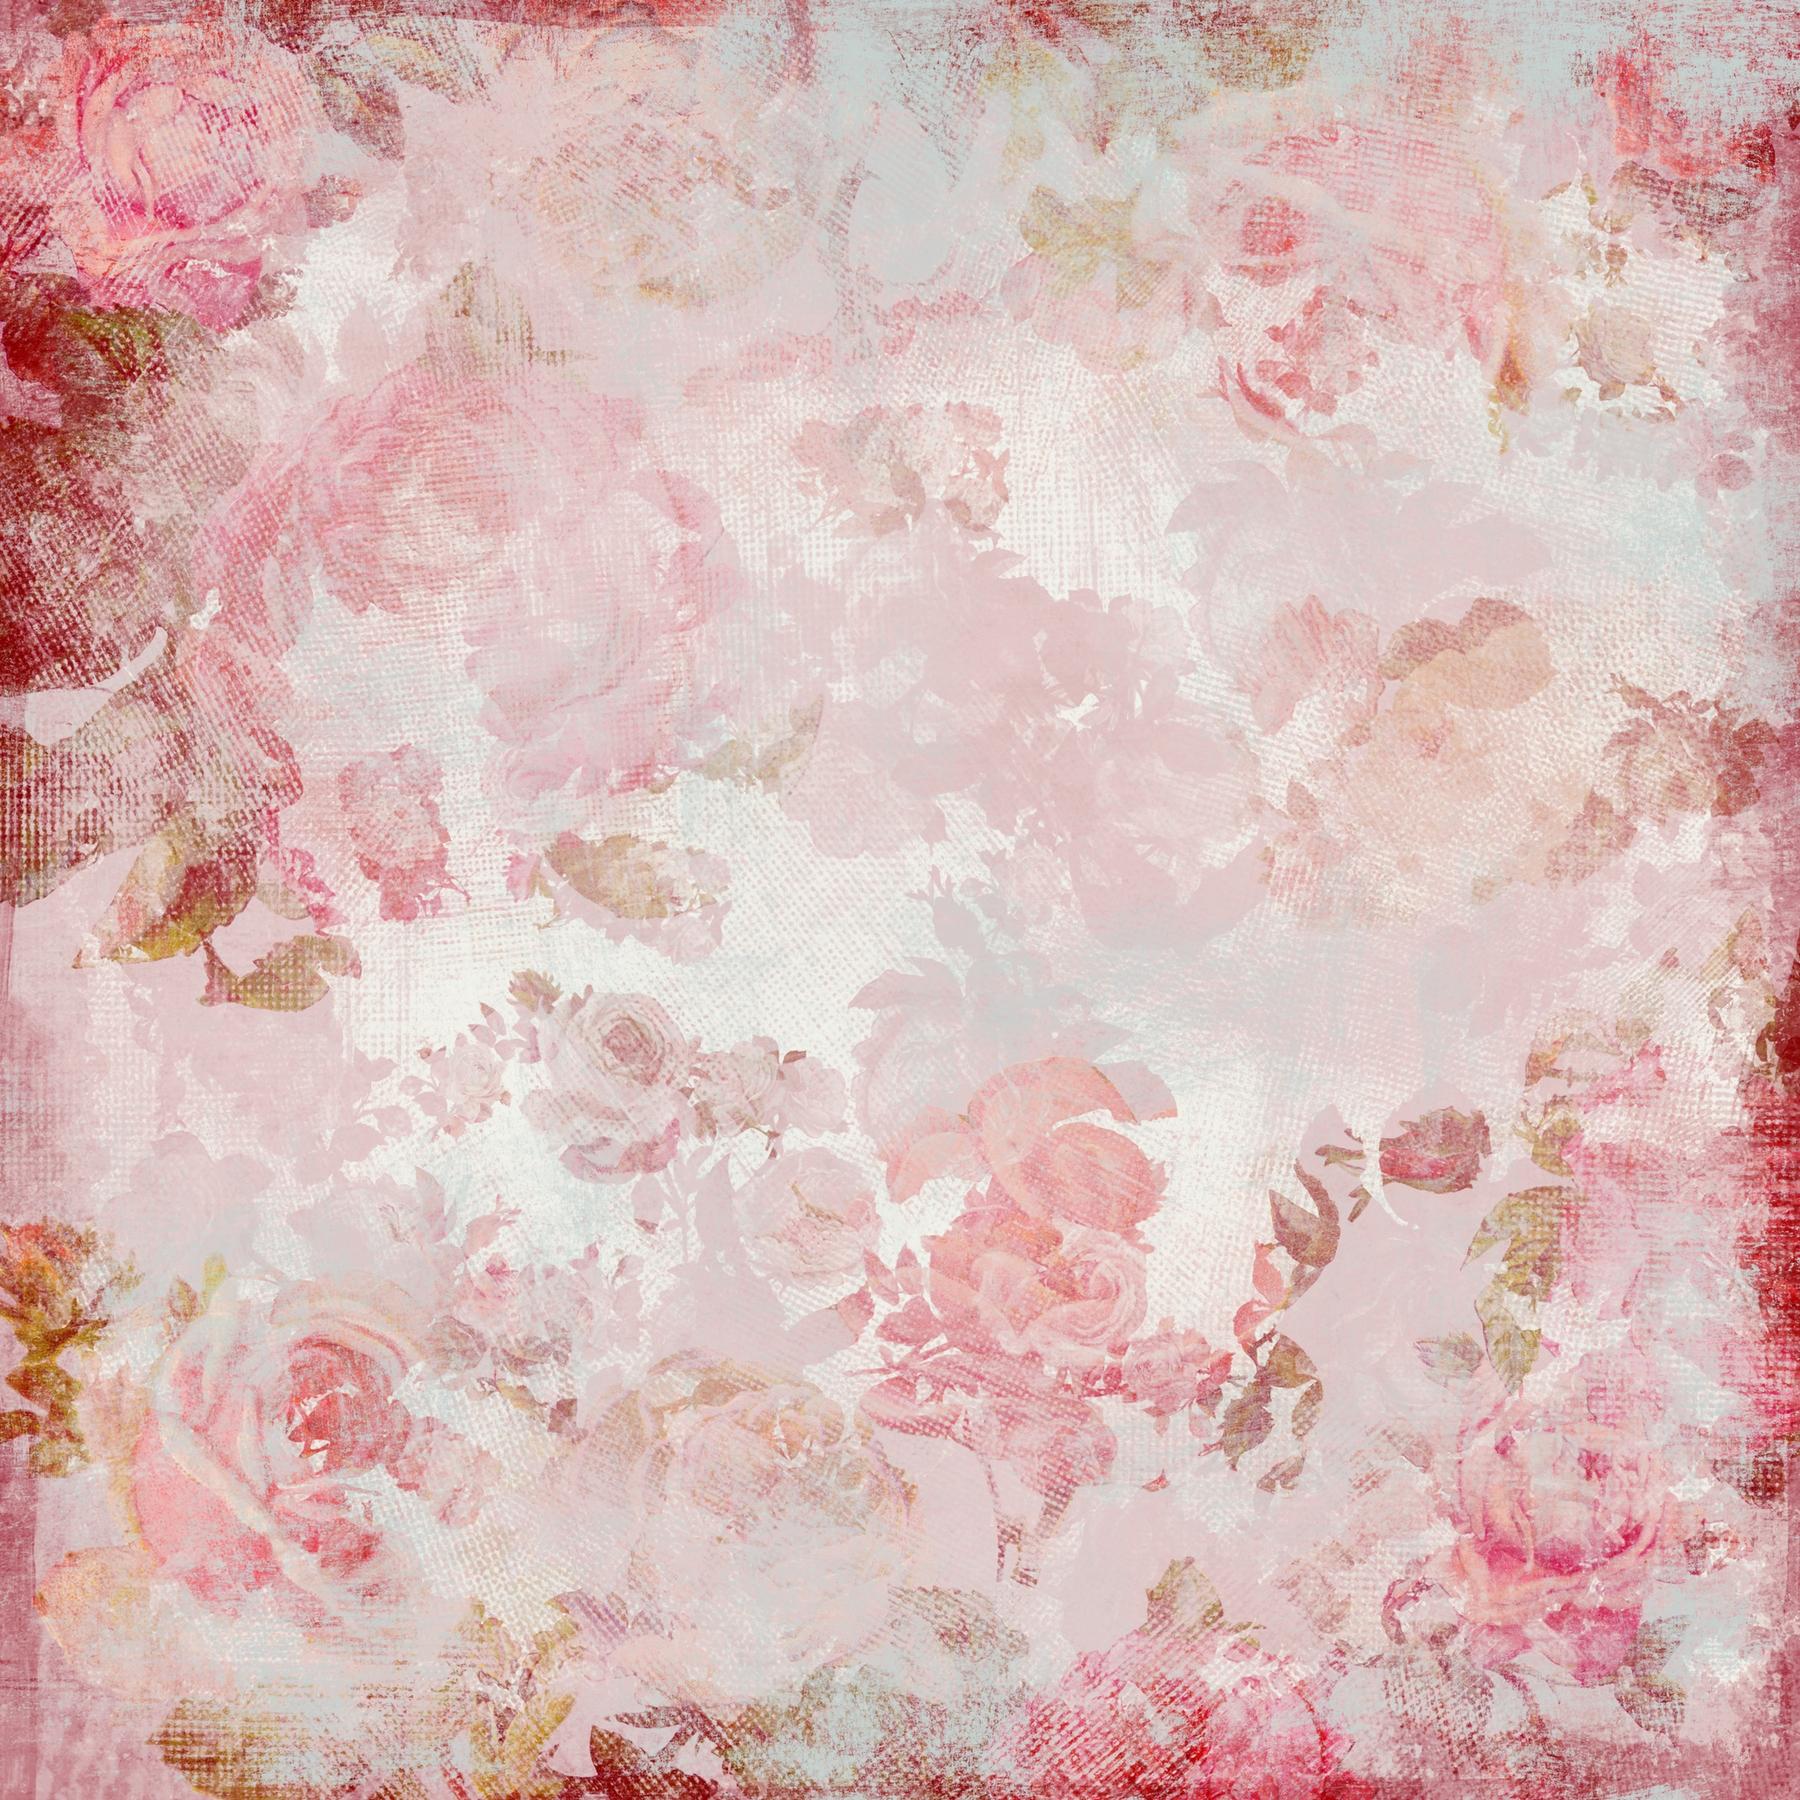 Flower Wall Murals Uk Pink Roses Pattern Wall Mural Photo Wallpaper Happywall